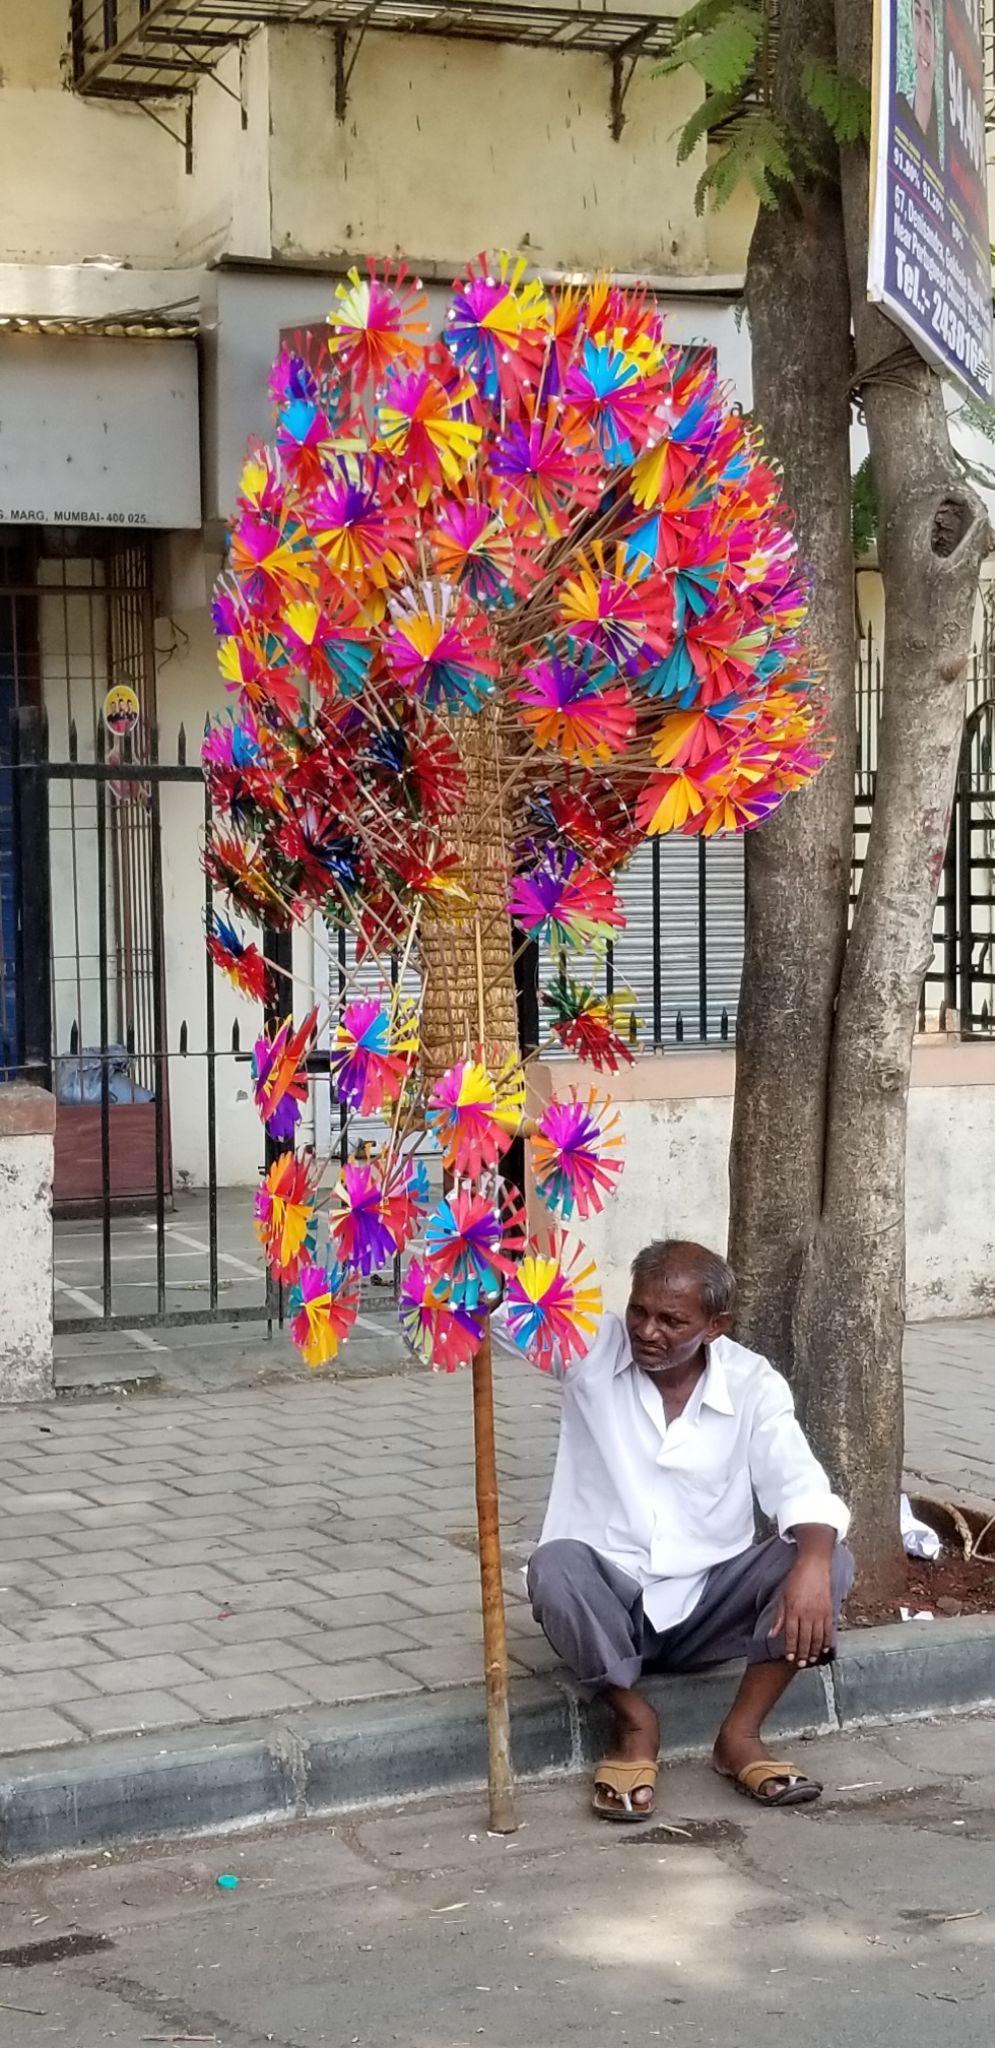 Photo of Siddhivinayak Mandir Dadar West By Shibya Pandey